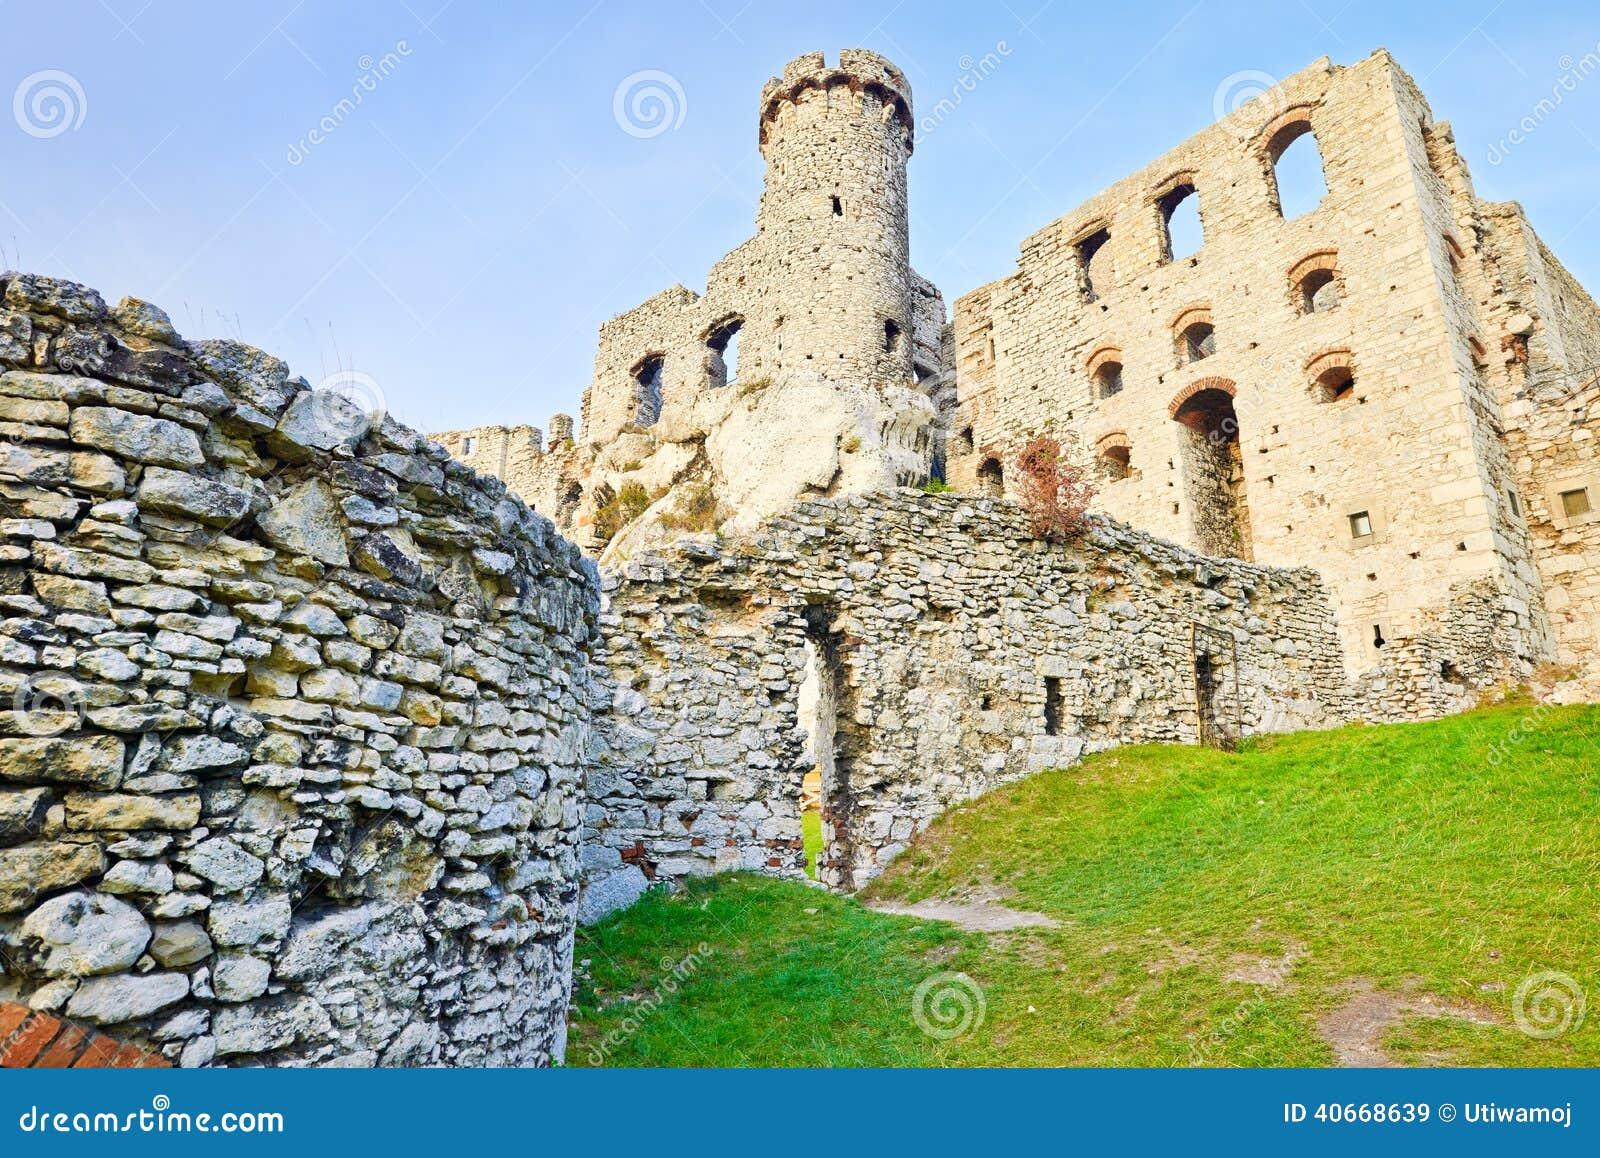 Old ruins Ogrodzieniec Castle Poland